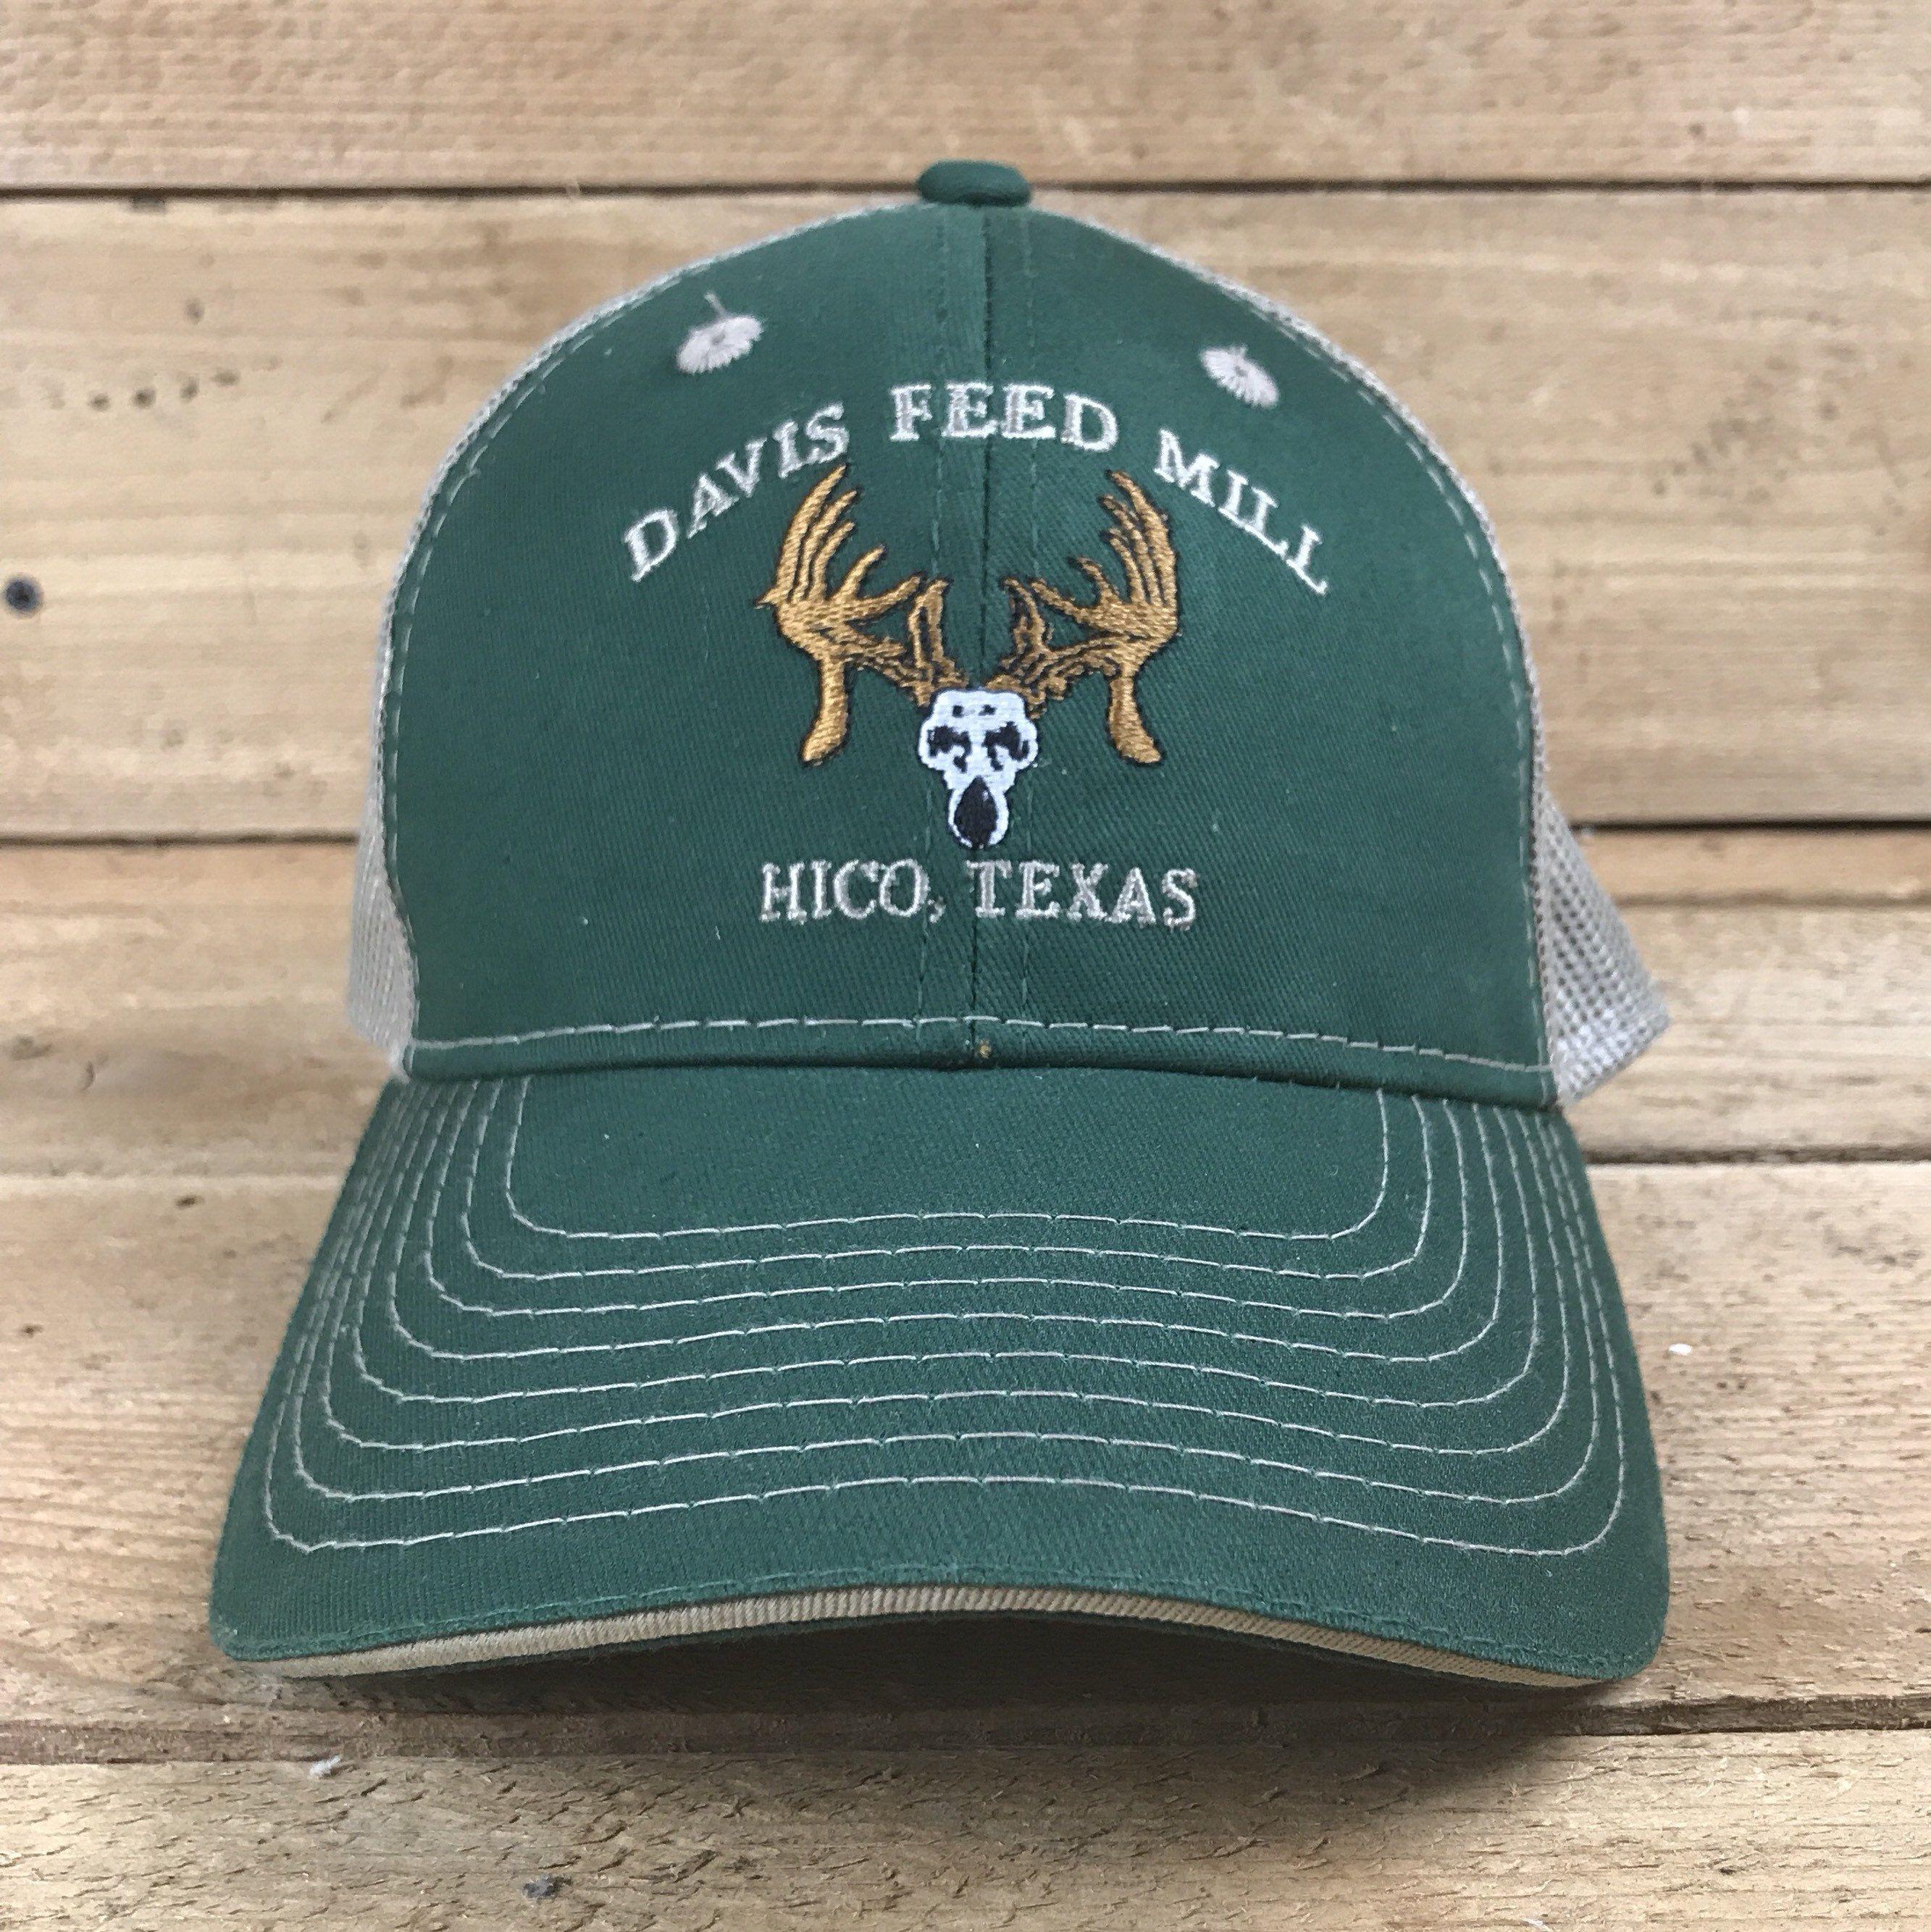 Hico Texas Tx Davis Feed Mill Green Hat Etsy Green Hats Hico Hats